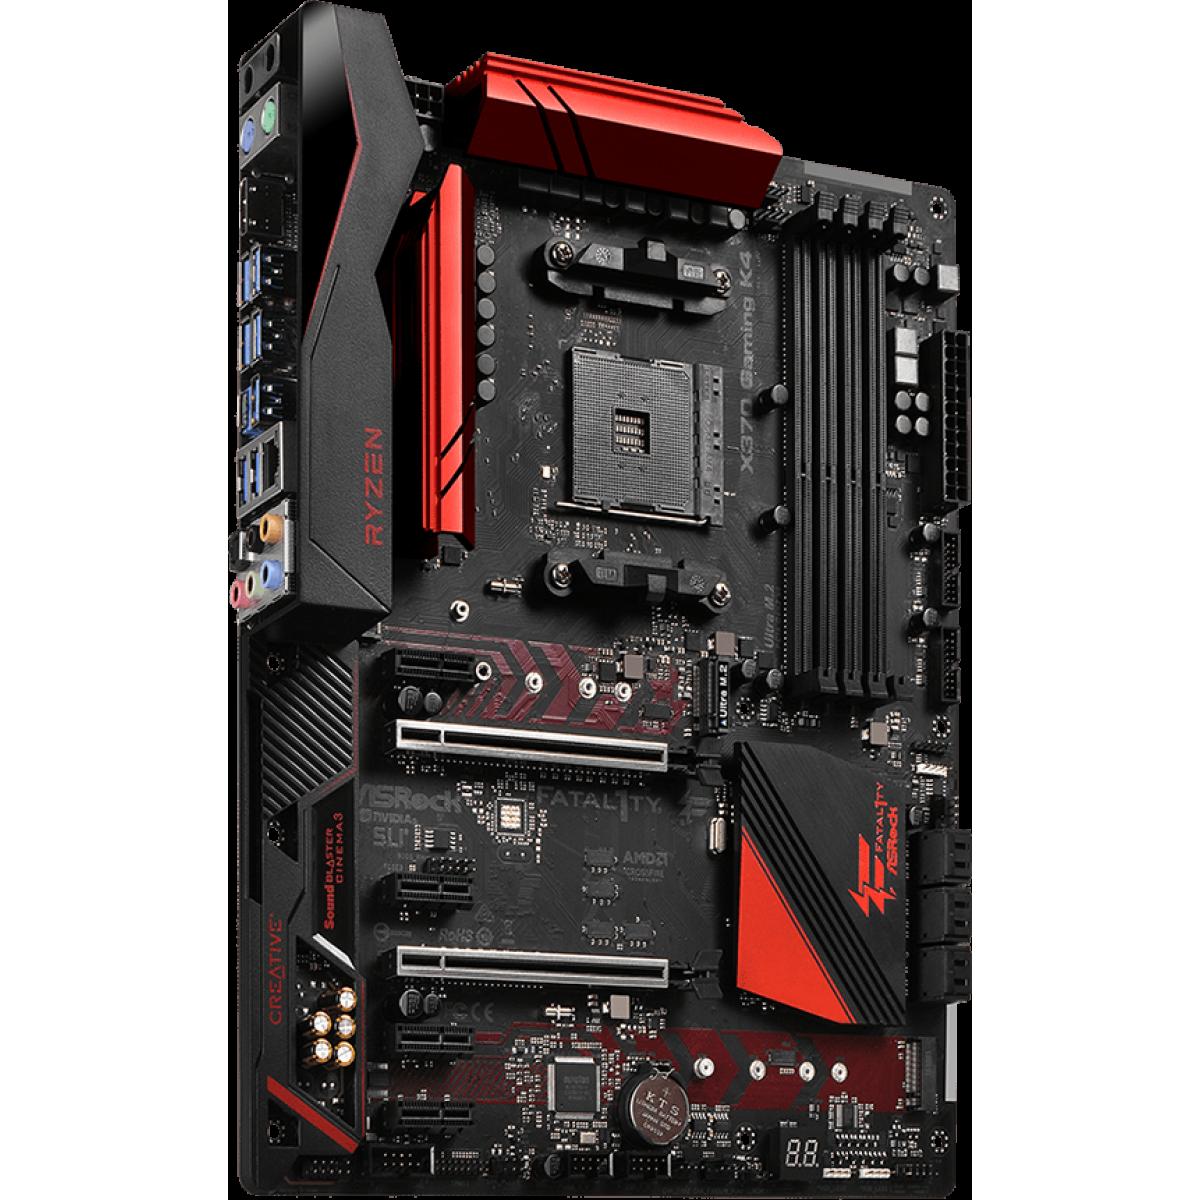 Placa Mãe Asrock Fatal1ty X370 Gaming K4, Chipset X370, AMD AM4, ATX, DDR4